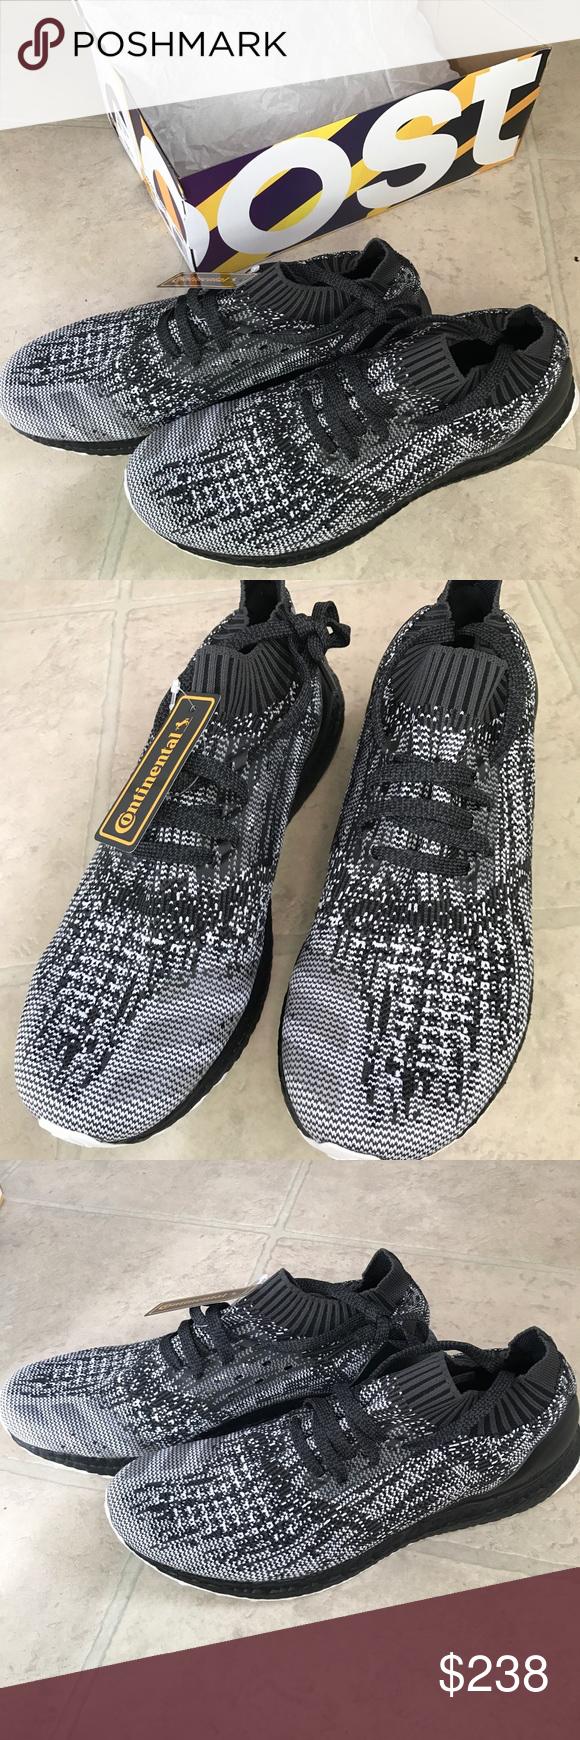 fc5145196 Adidas ultra boost uncaged triple black size 10